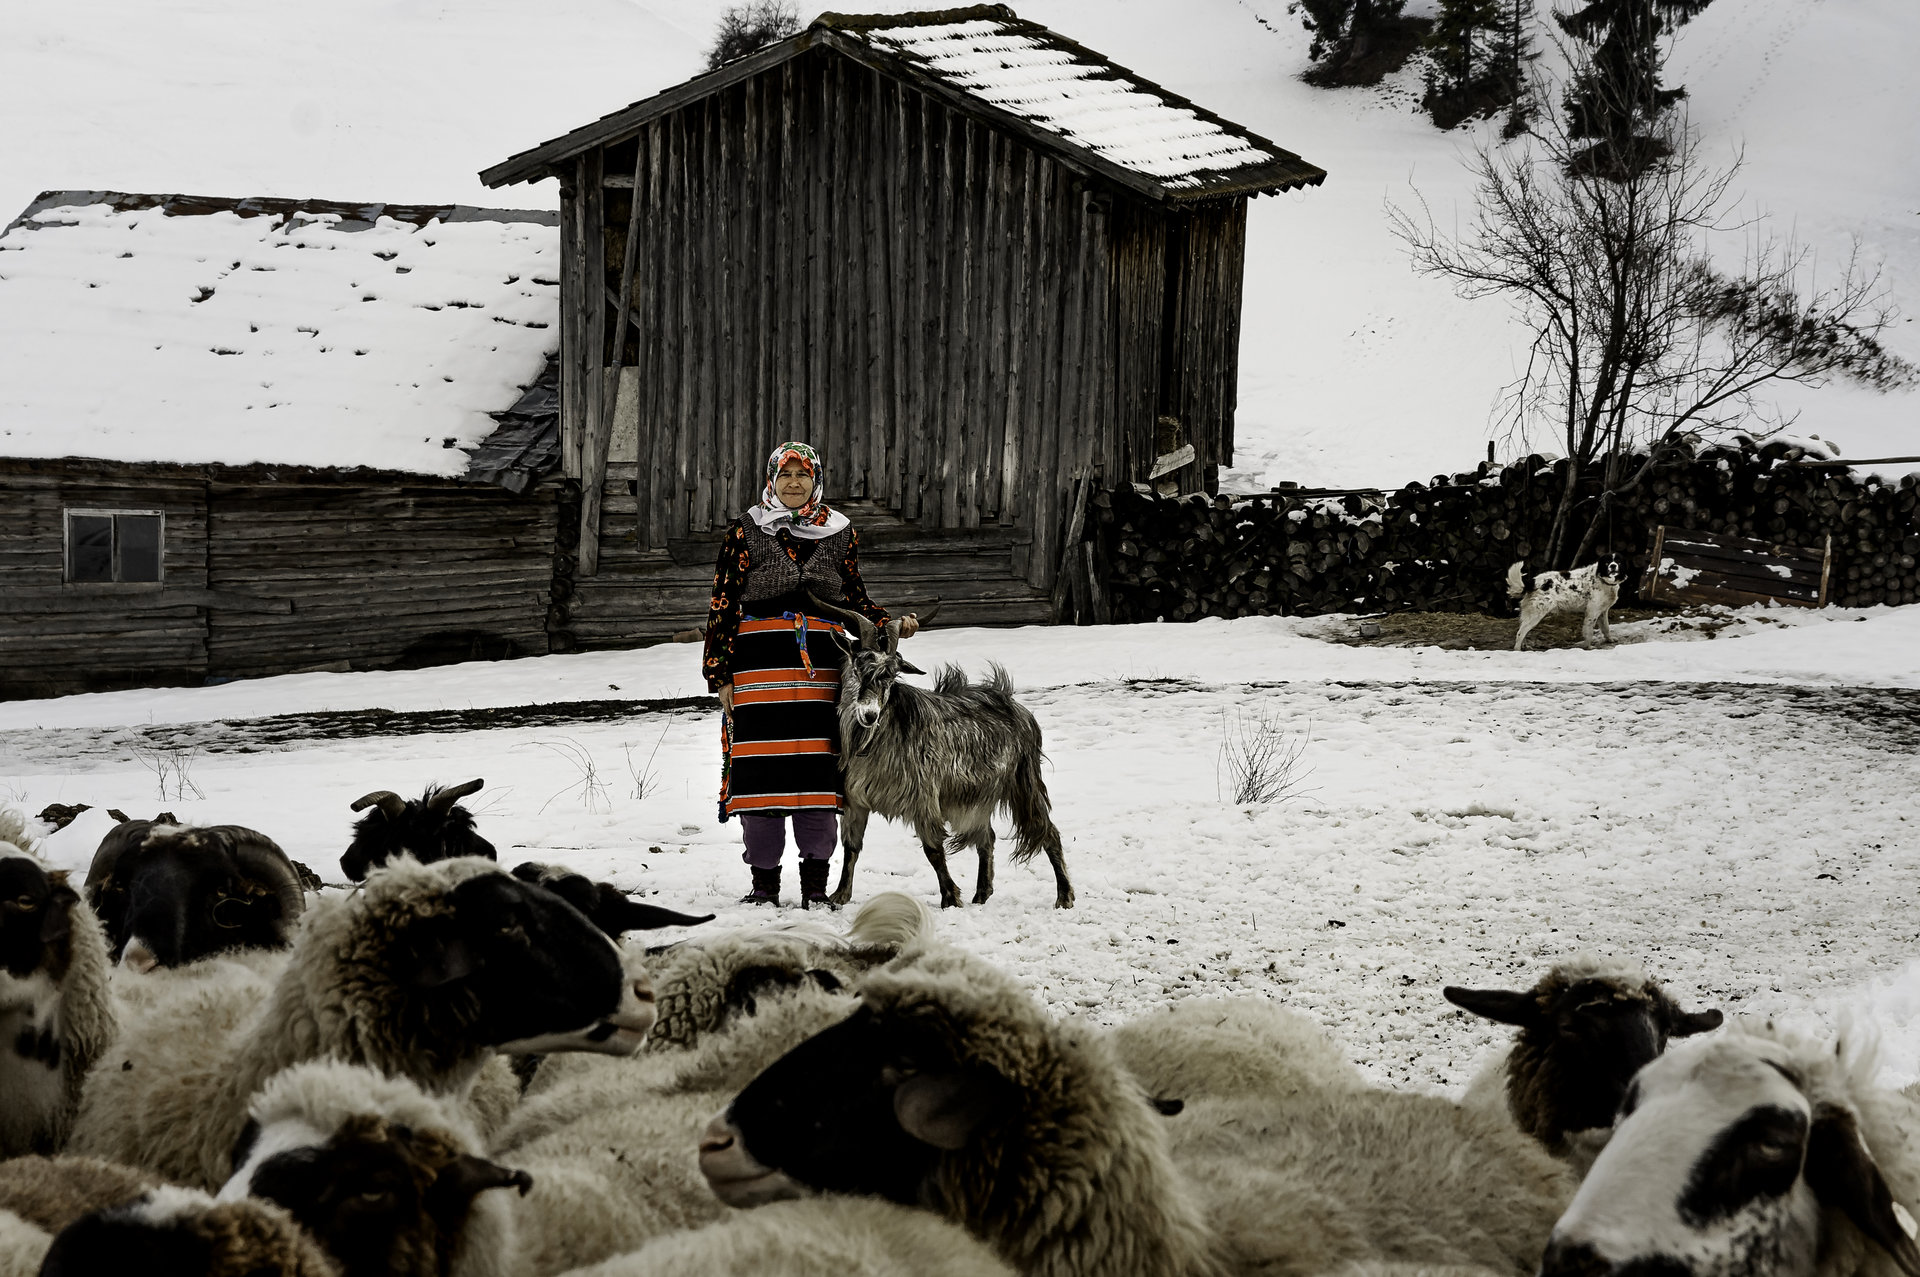 Photo in Reportage | Author sunnyhope | PHOTO FORUM